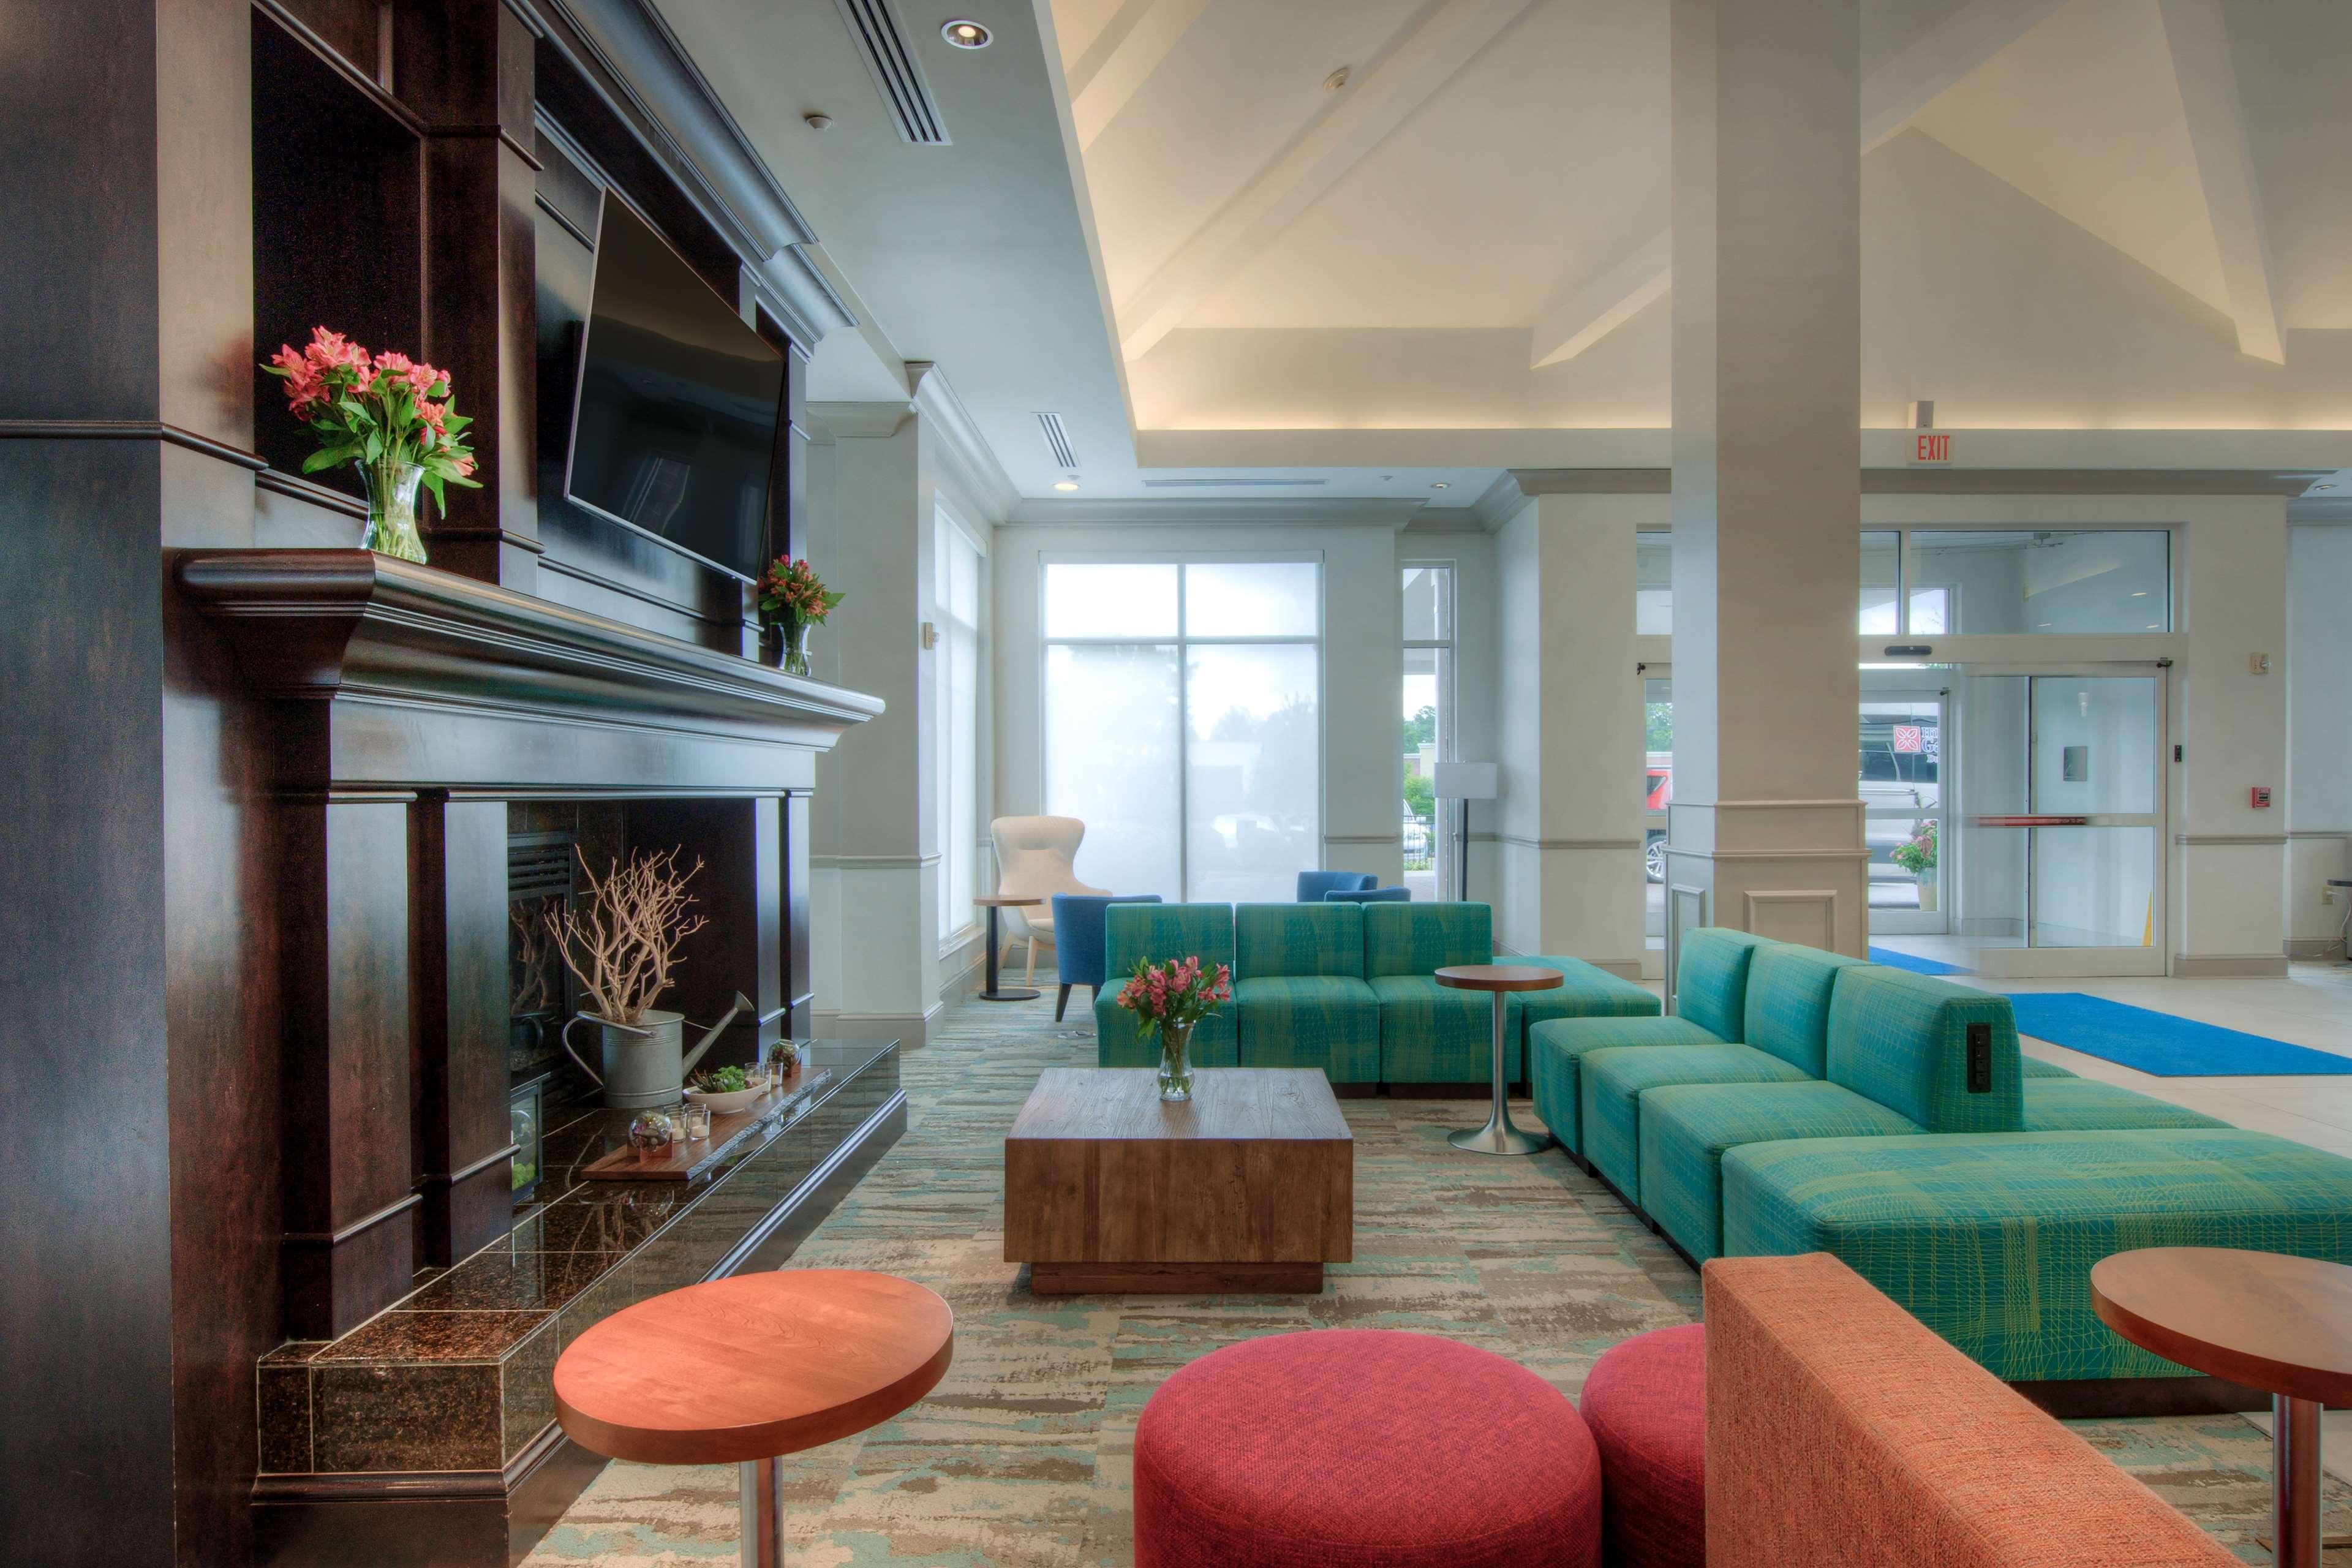 Hilton Garden Inn Durham Southpoint image 6